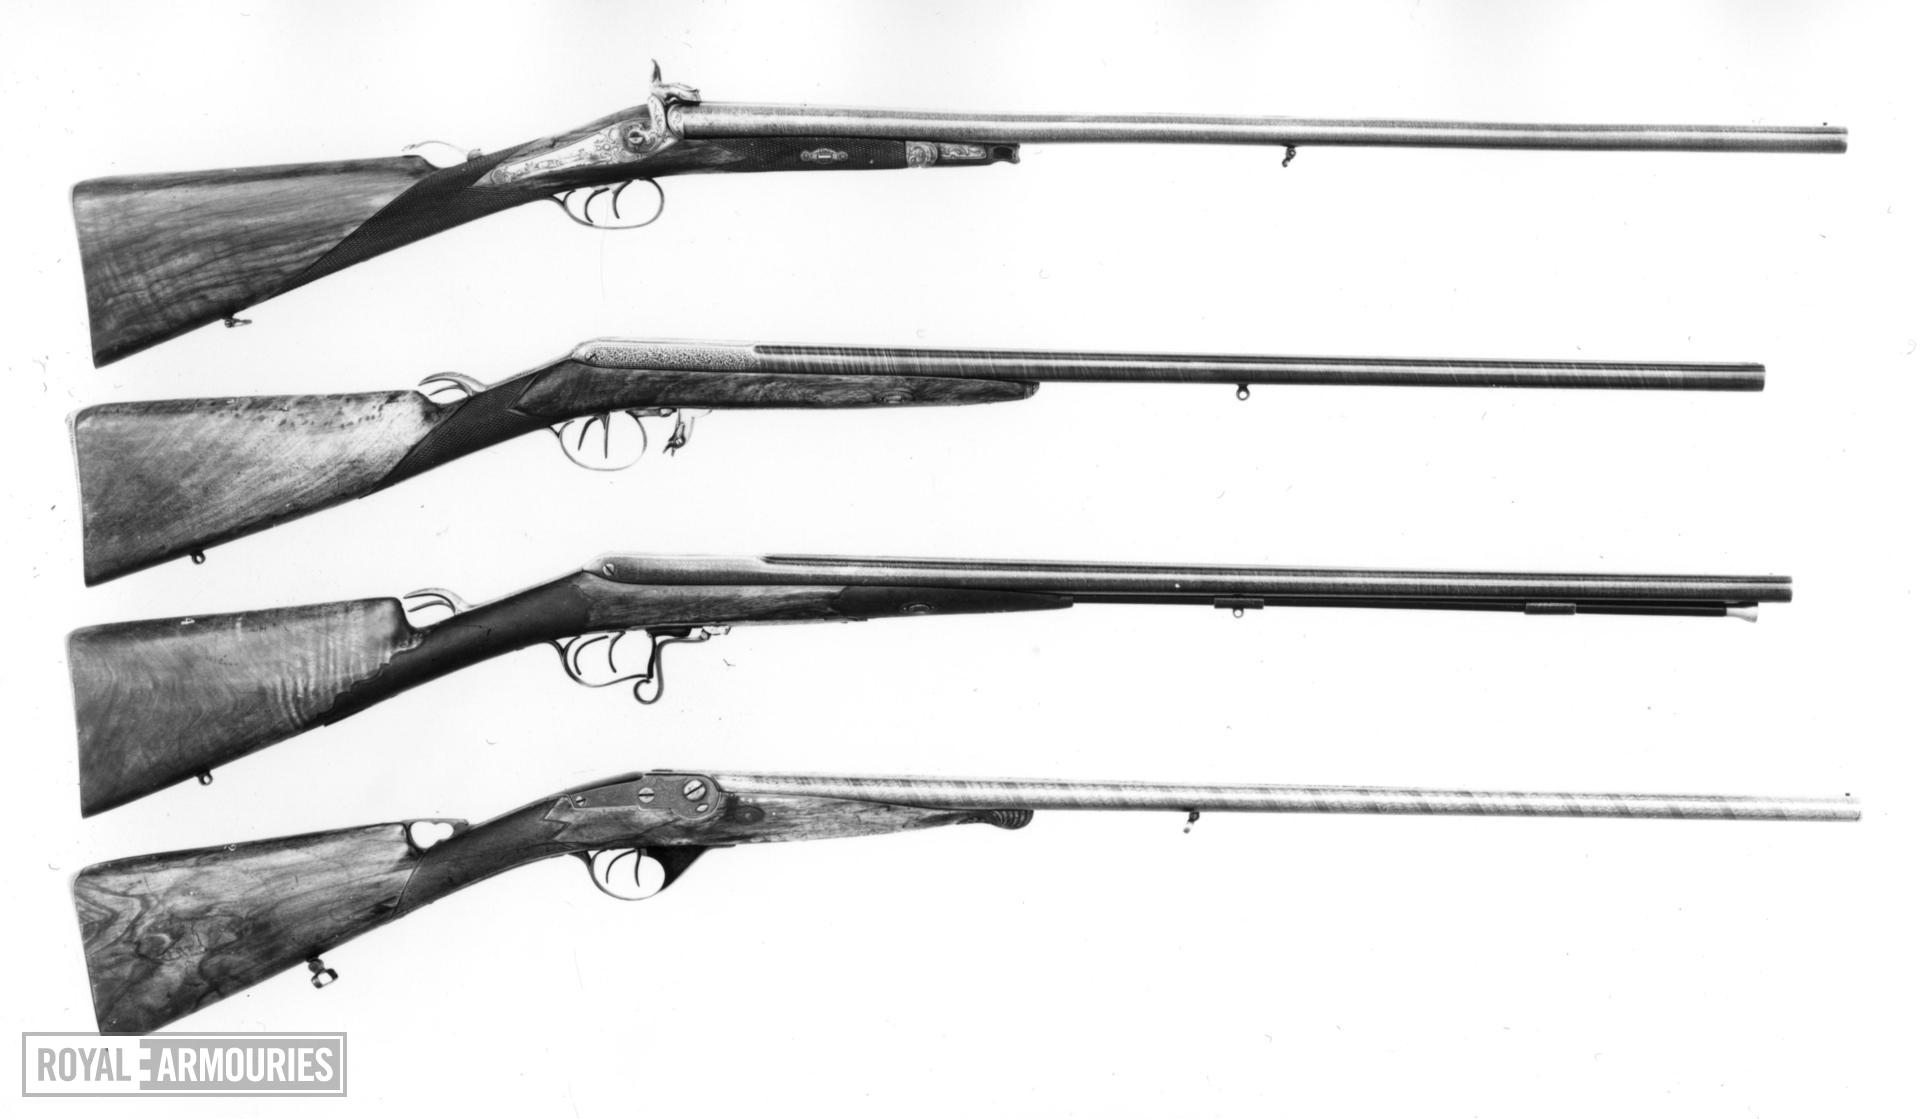 Pinfire breech-loading double-barrelled shotgun - E. Baudon System